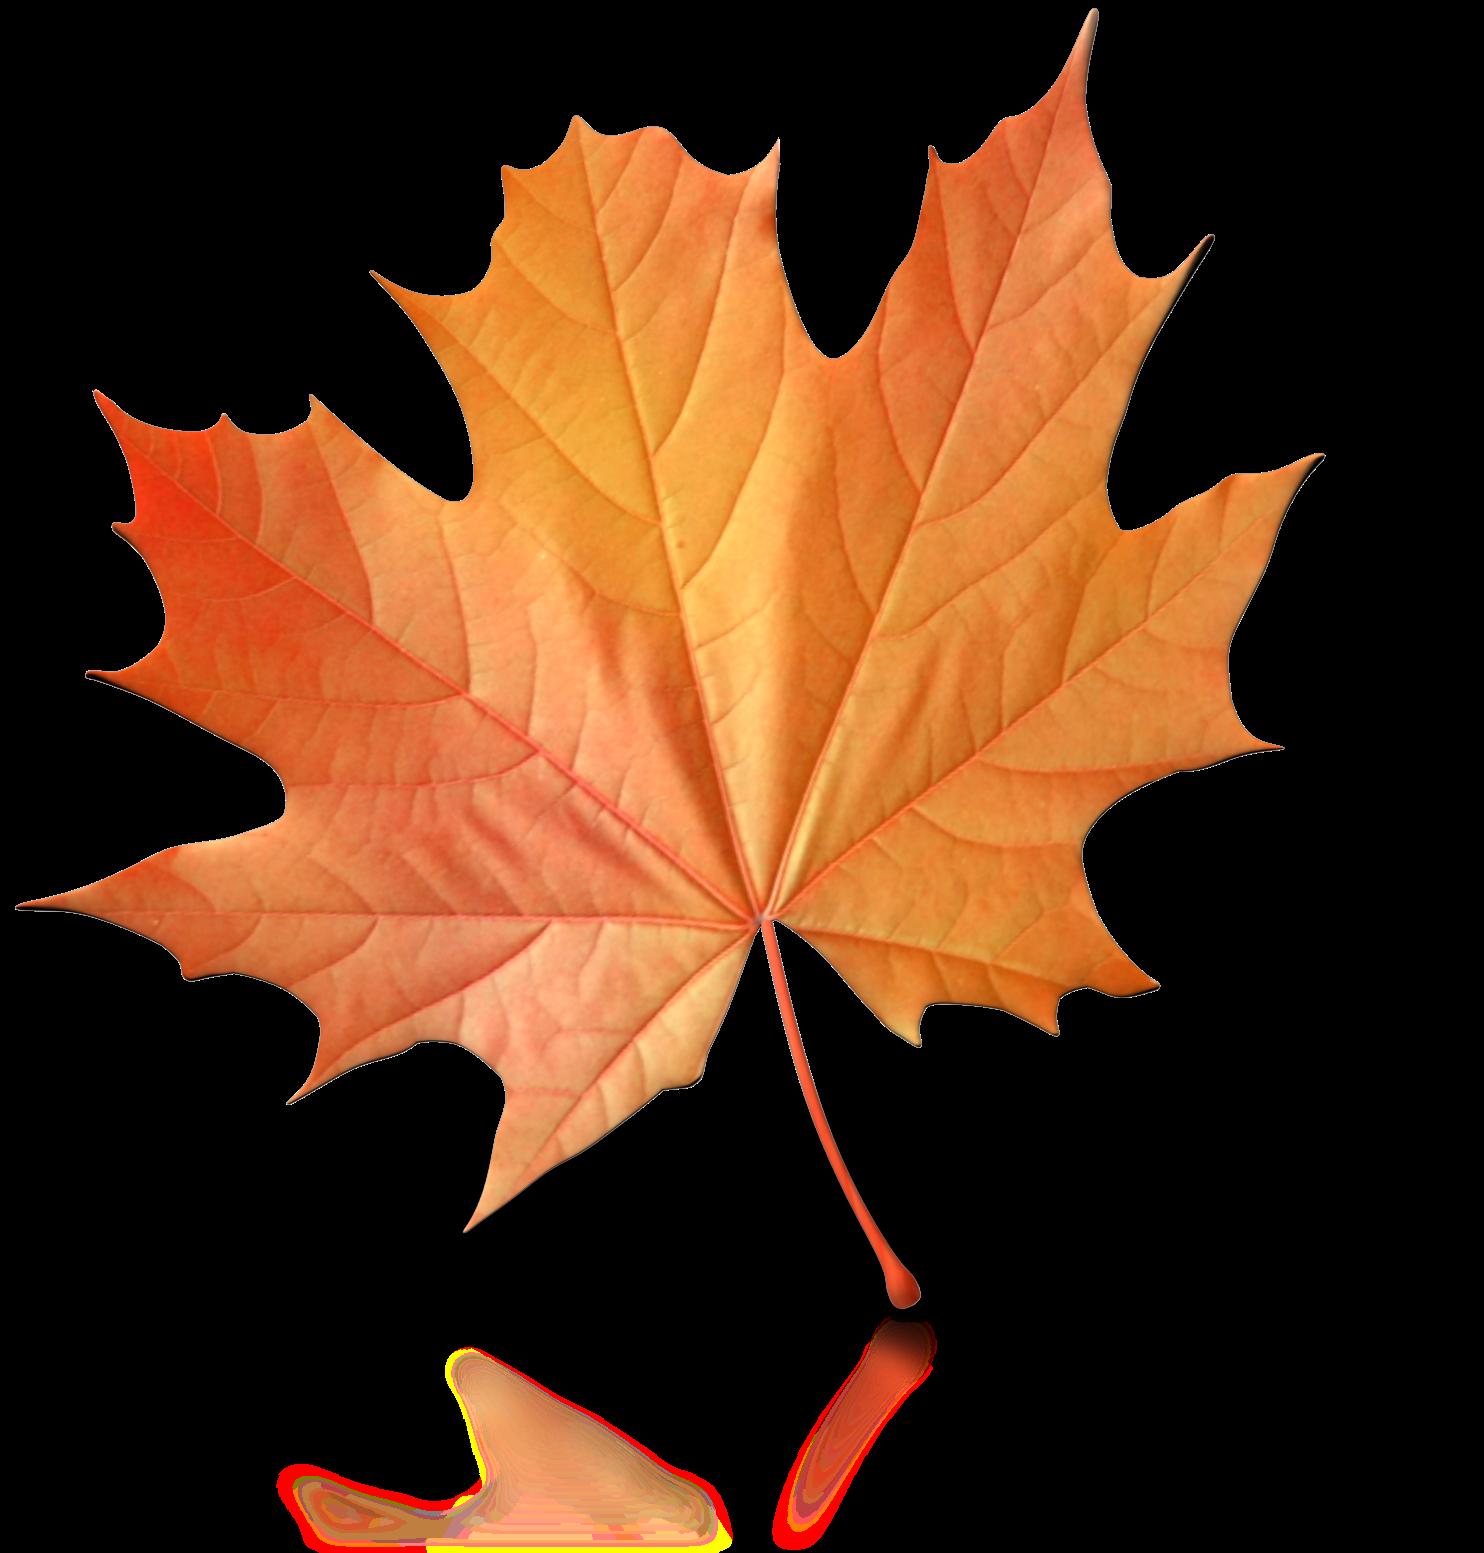 One Fall Leaf Png Clip Art.